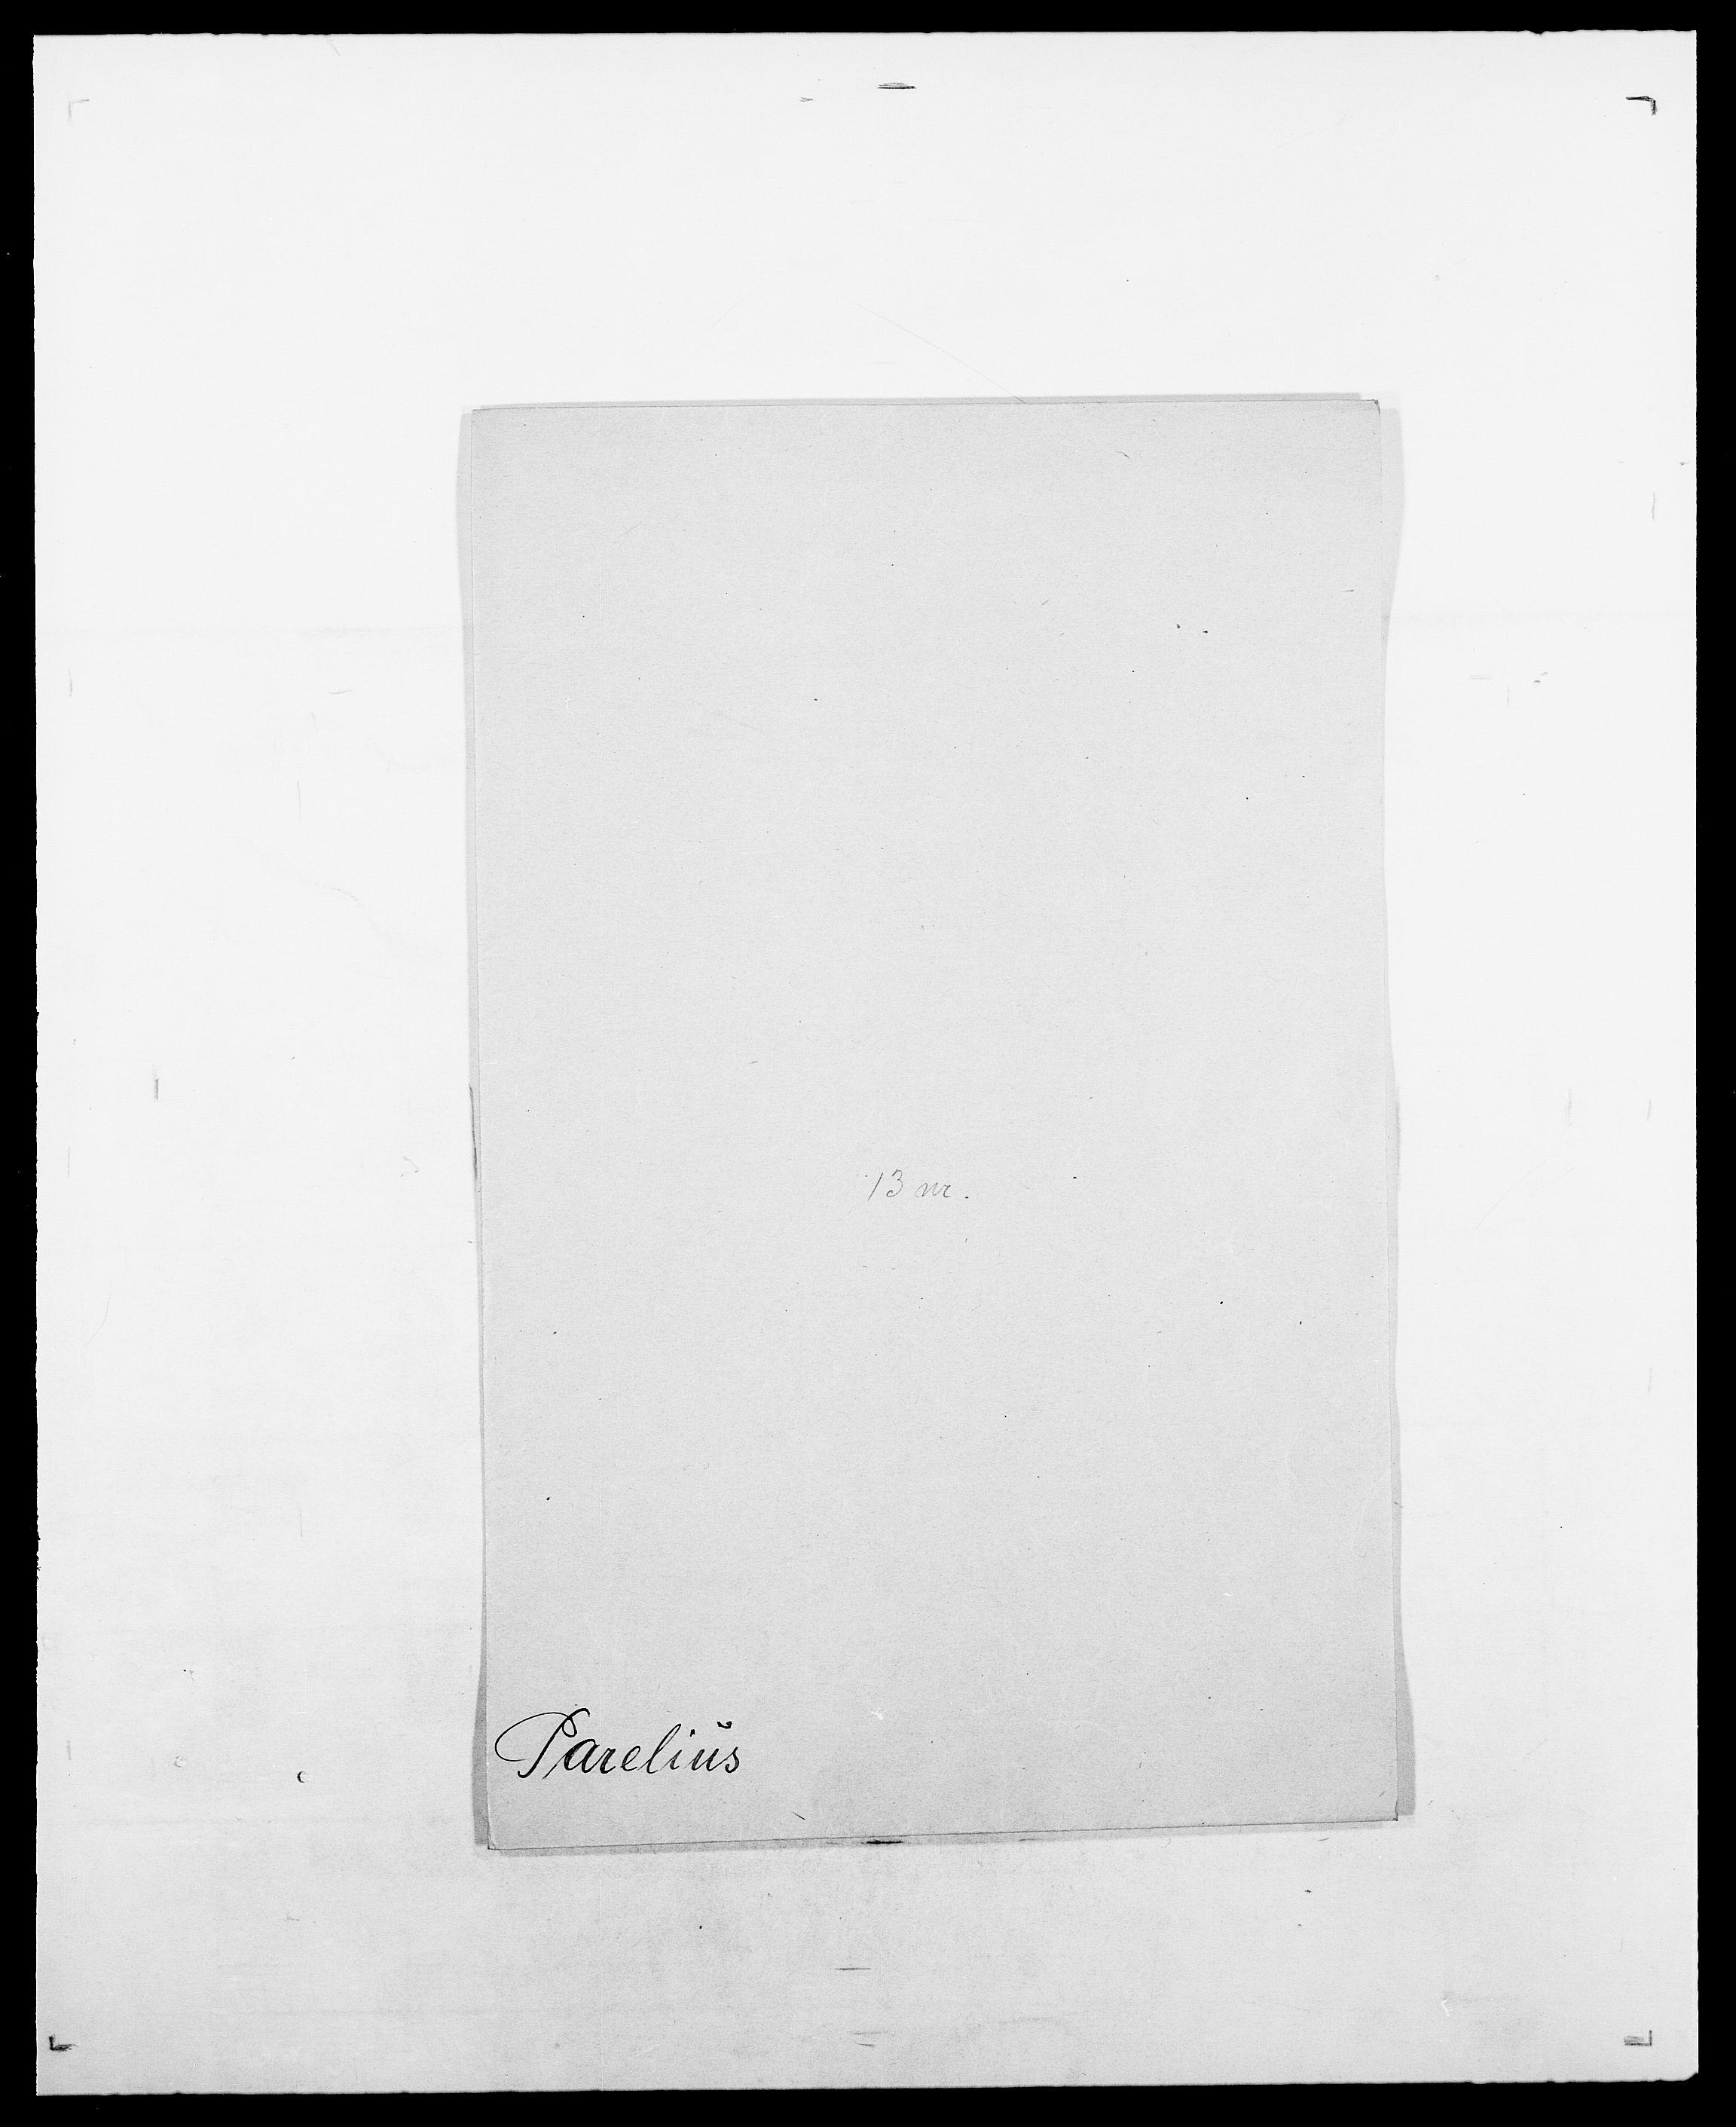 SAO, Delgobe, Charles Antoine - samling, D/Da/L0030: Paars - Pittelkov, s. 96